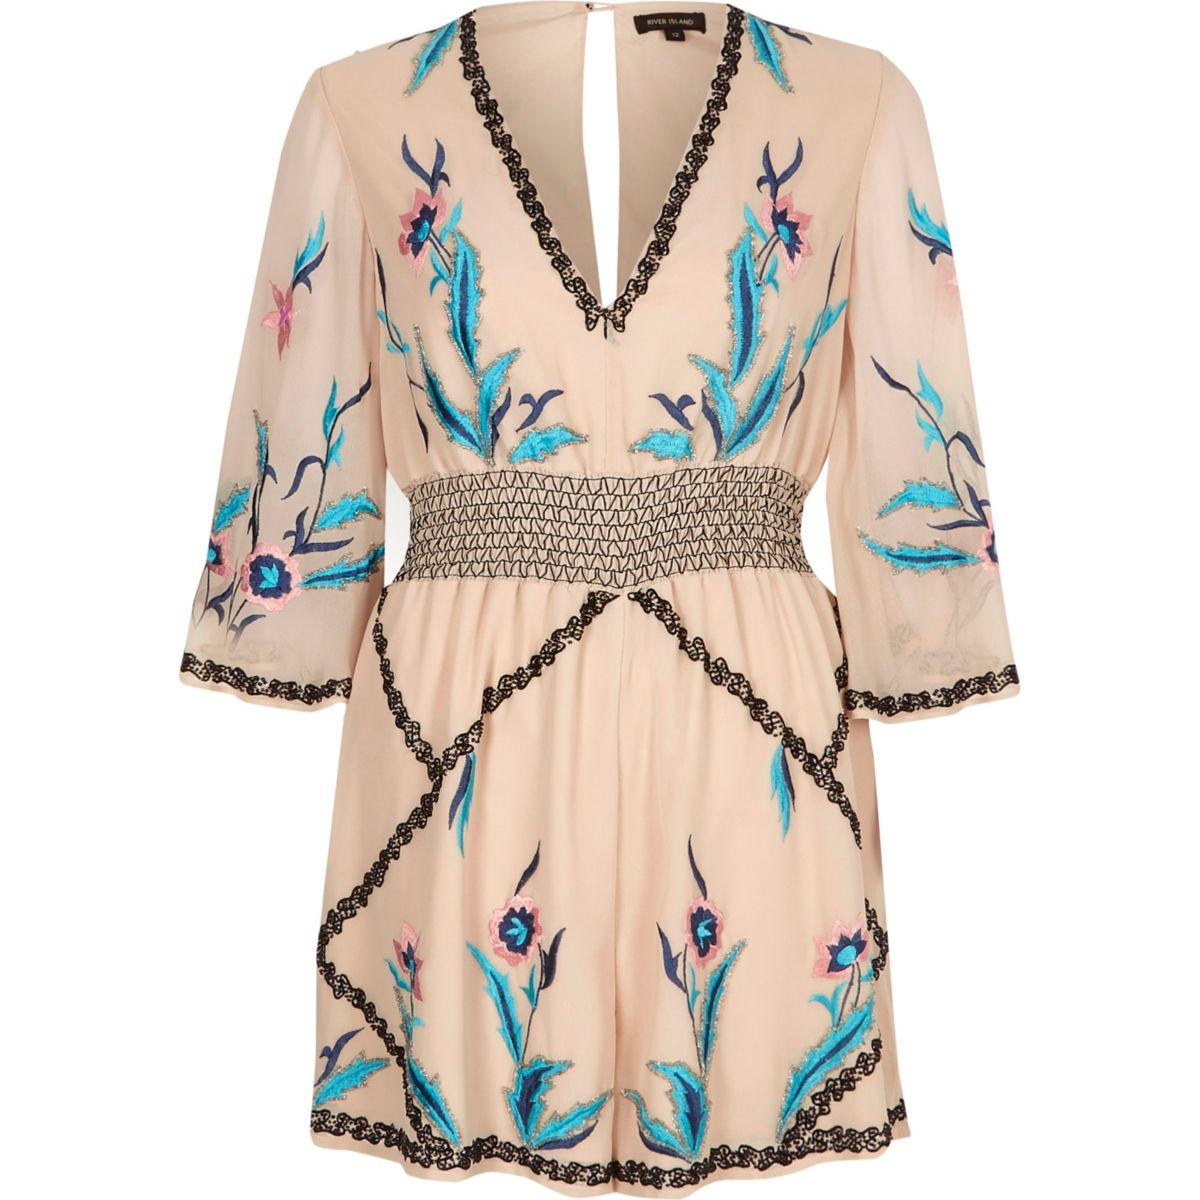 Cream floral embellished kimono romper